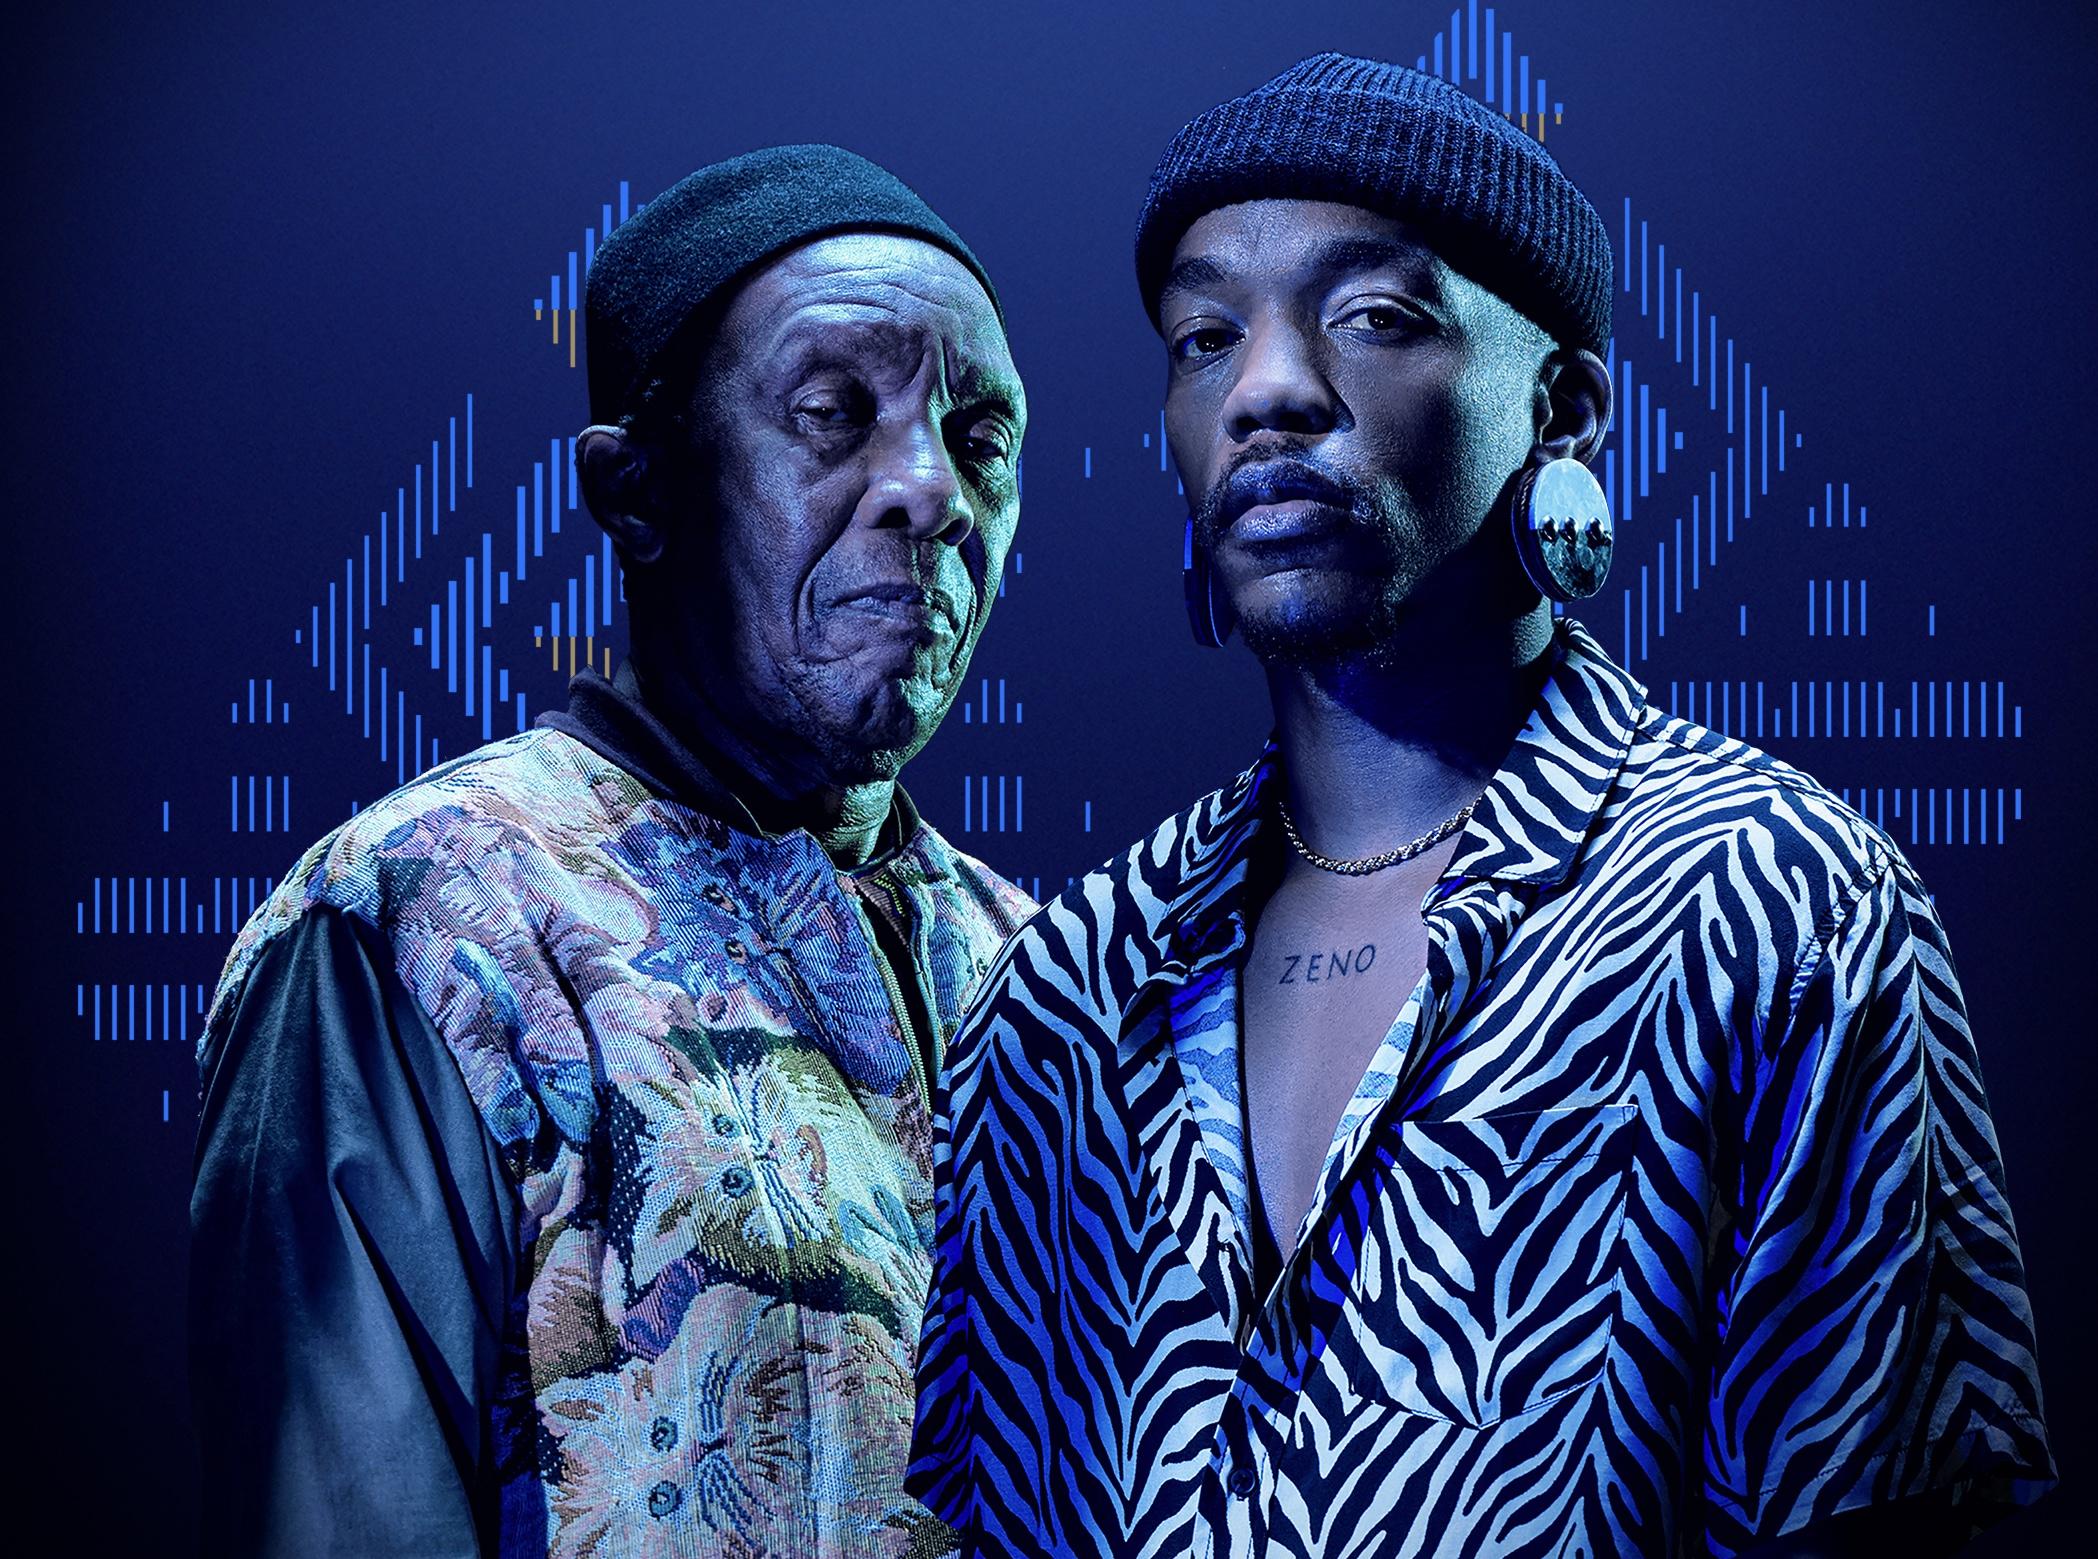 Madala Kunene and Muzi Collaborate On A Song